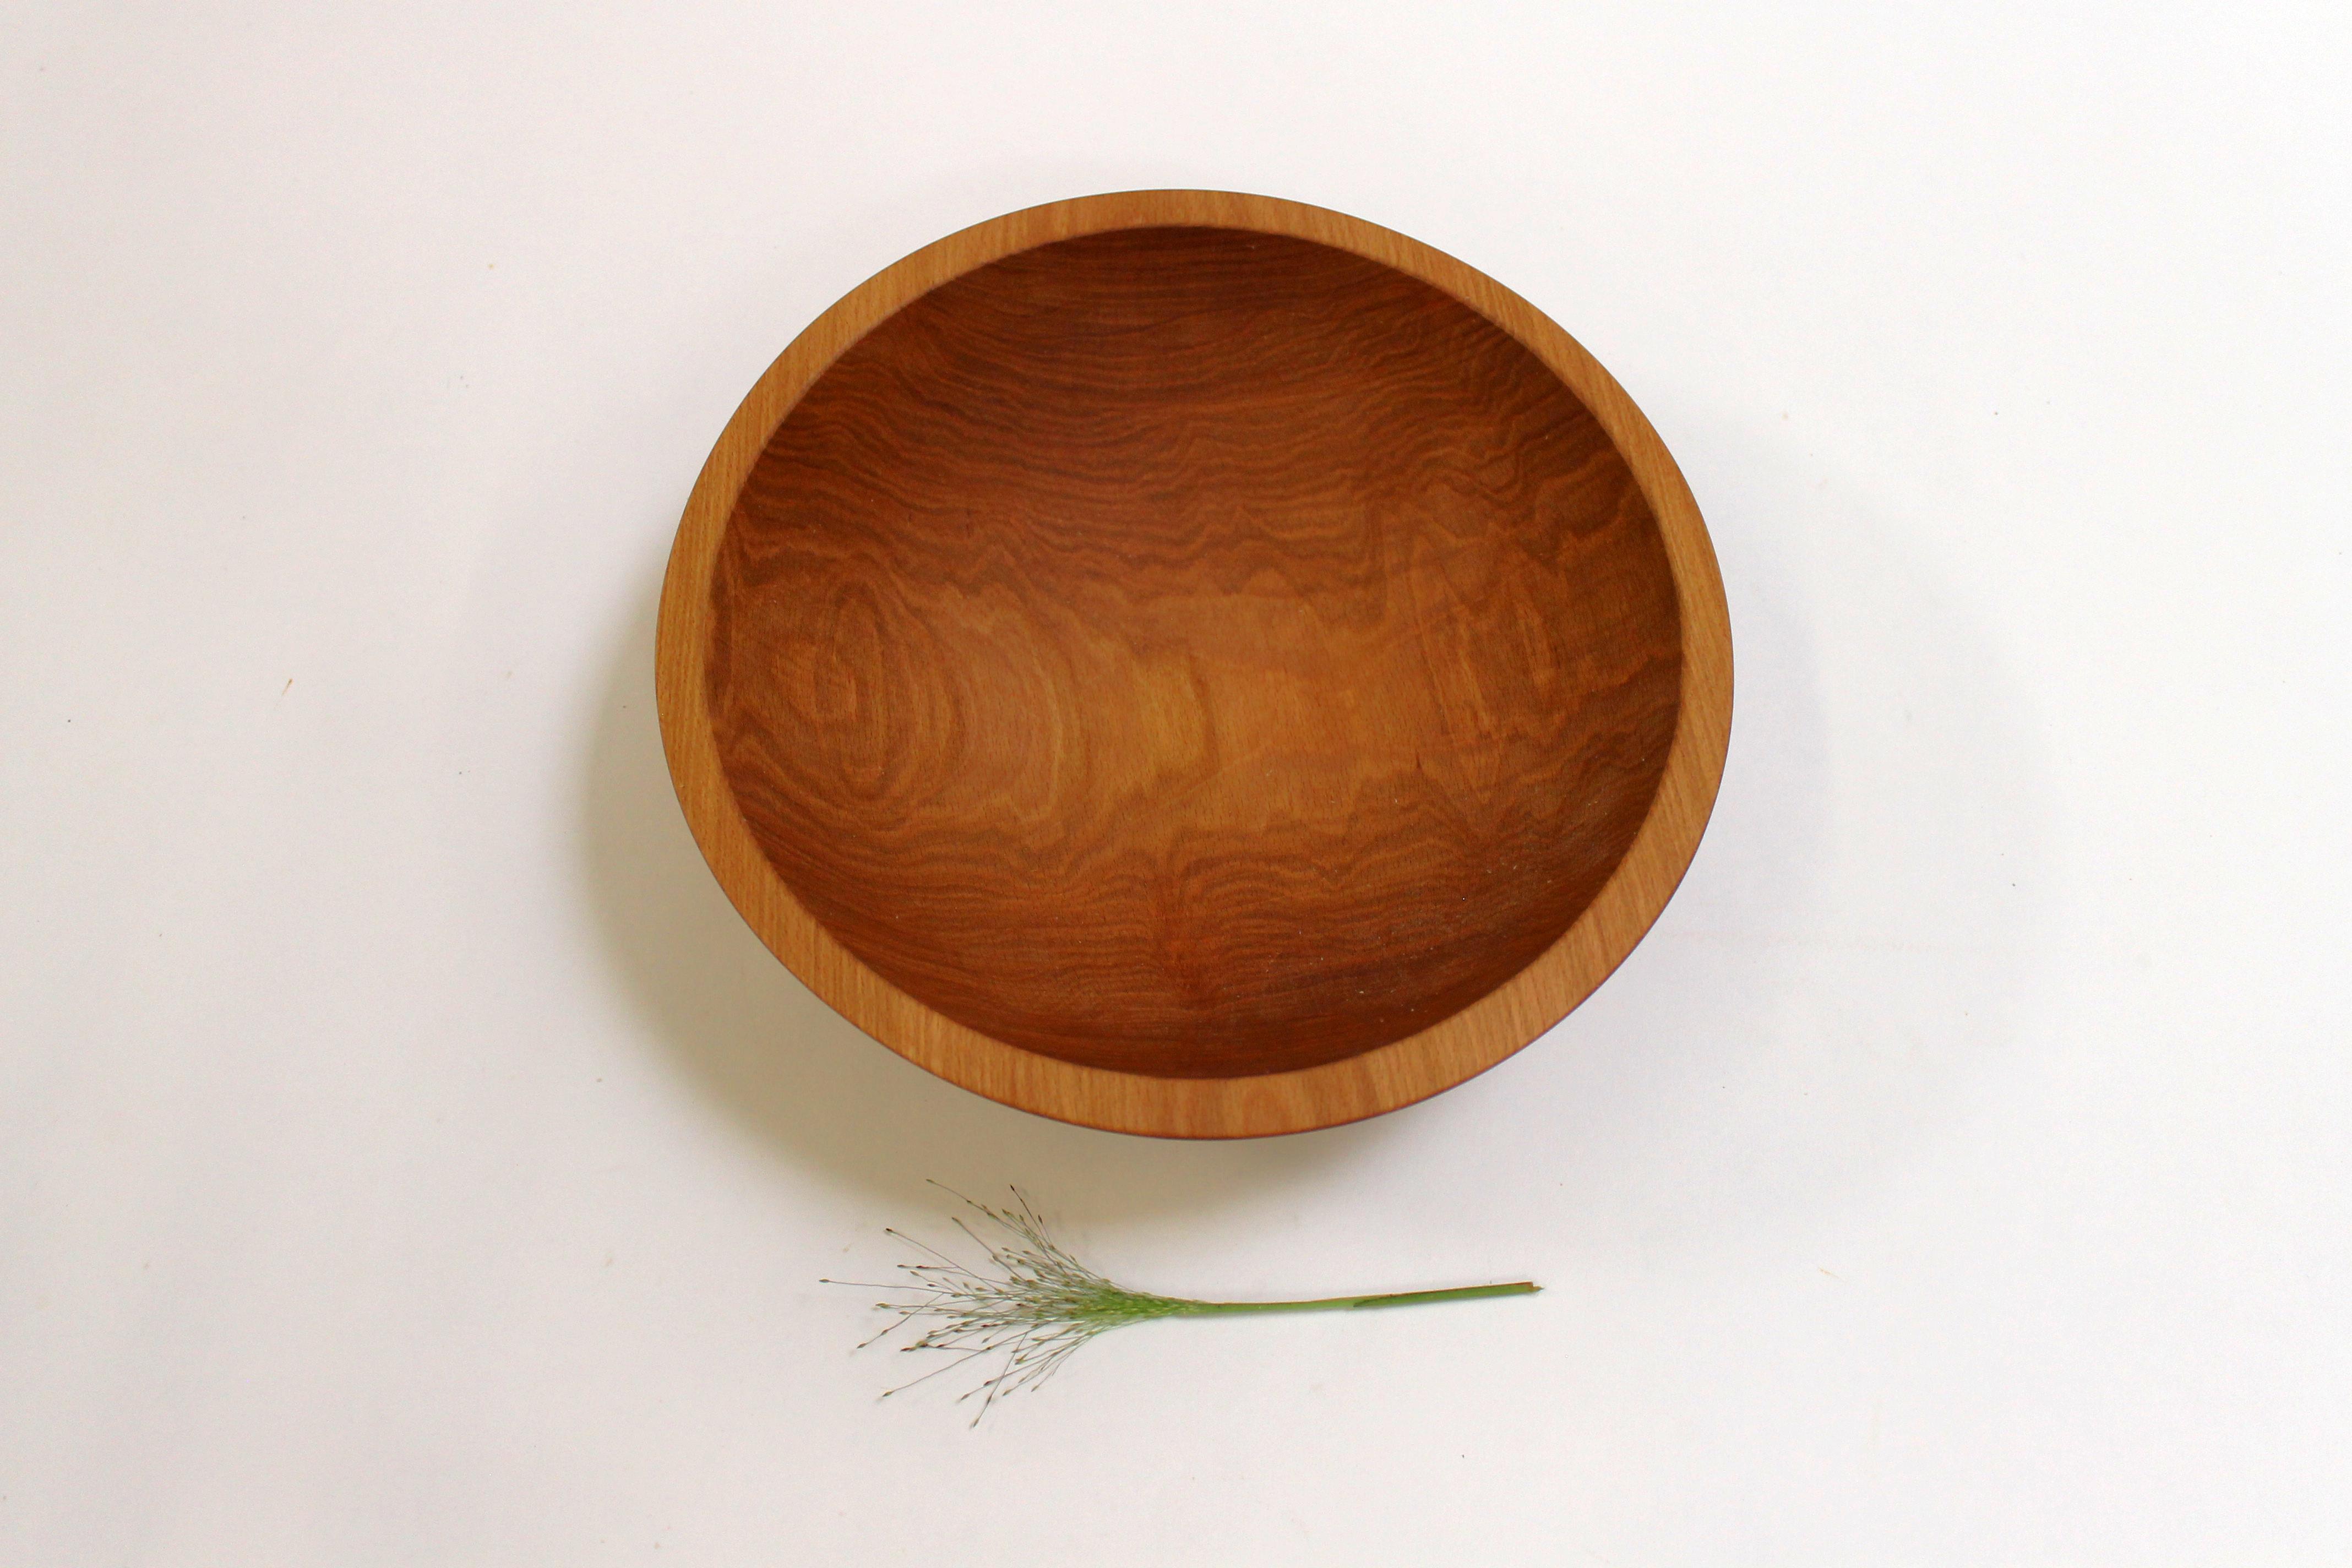 12 inch Beech Bowl - Light Walnut & Bee's Oil Finish 112WBLT